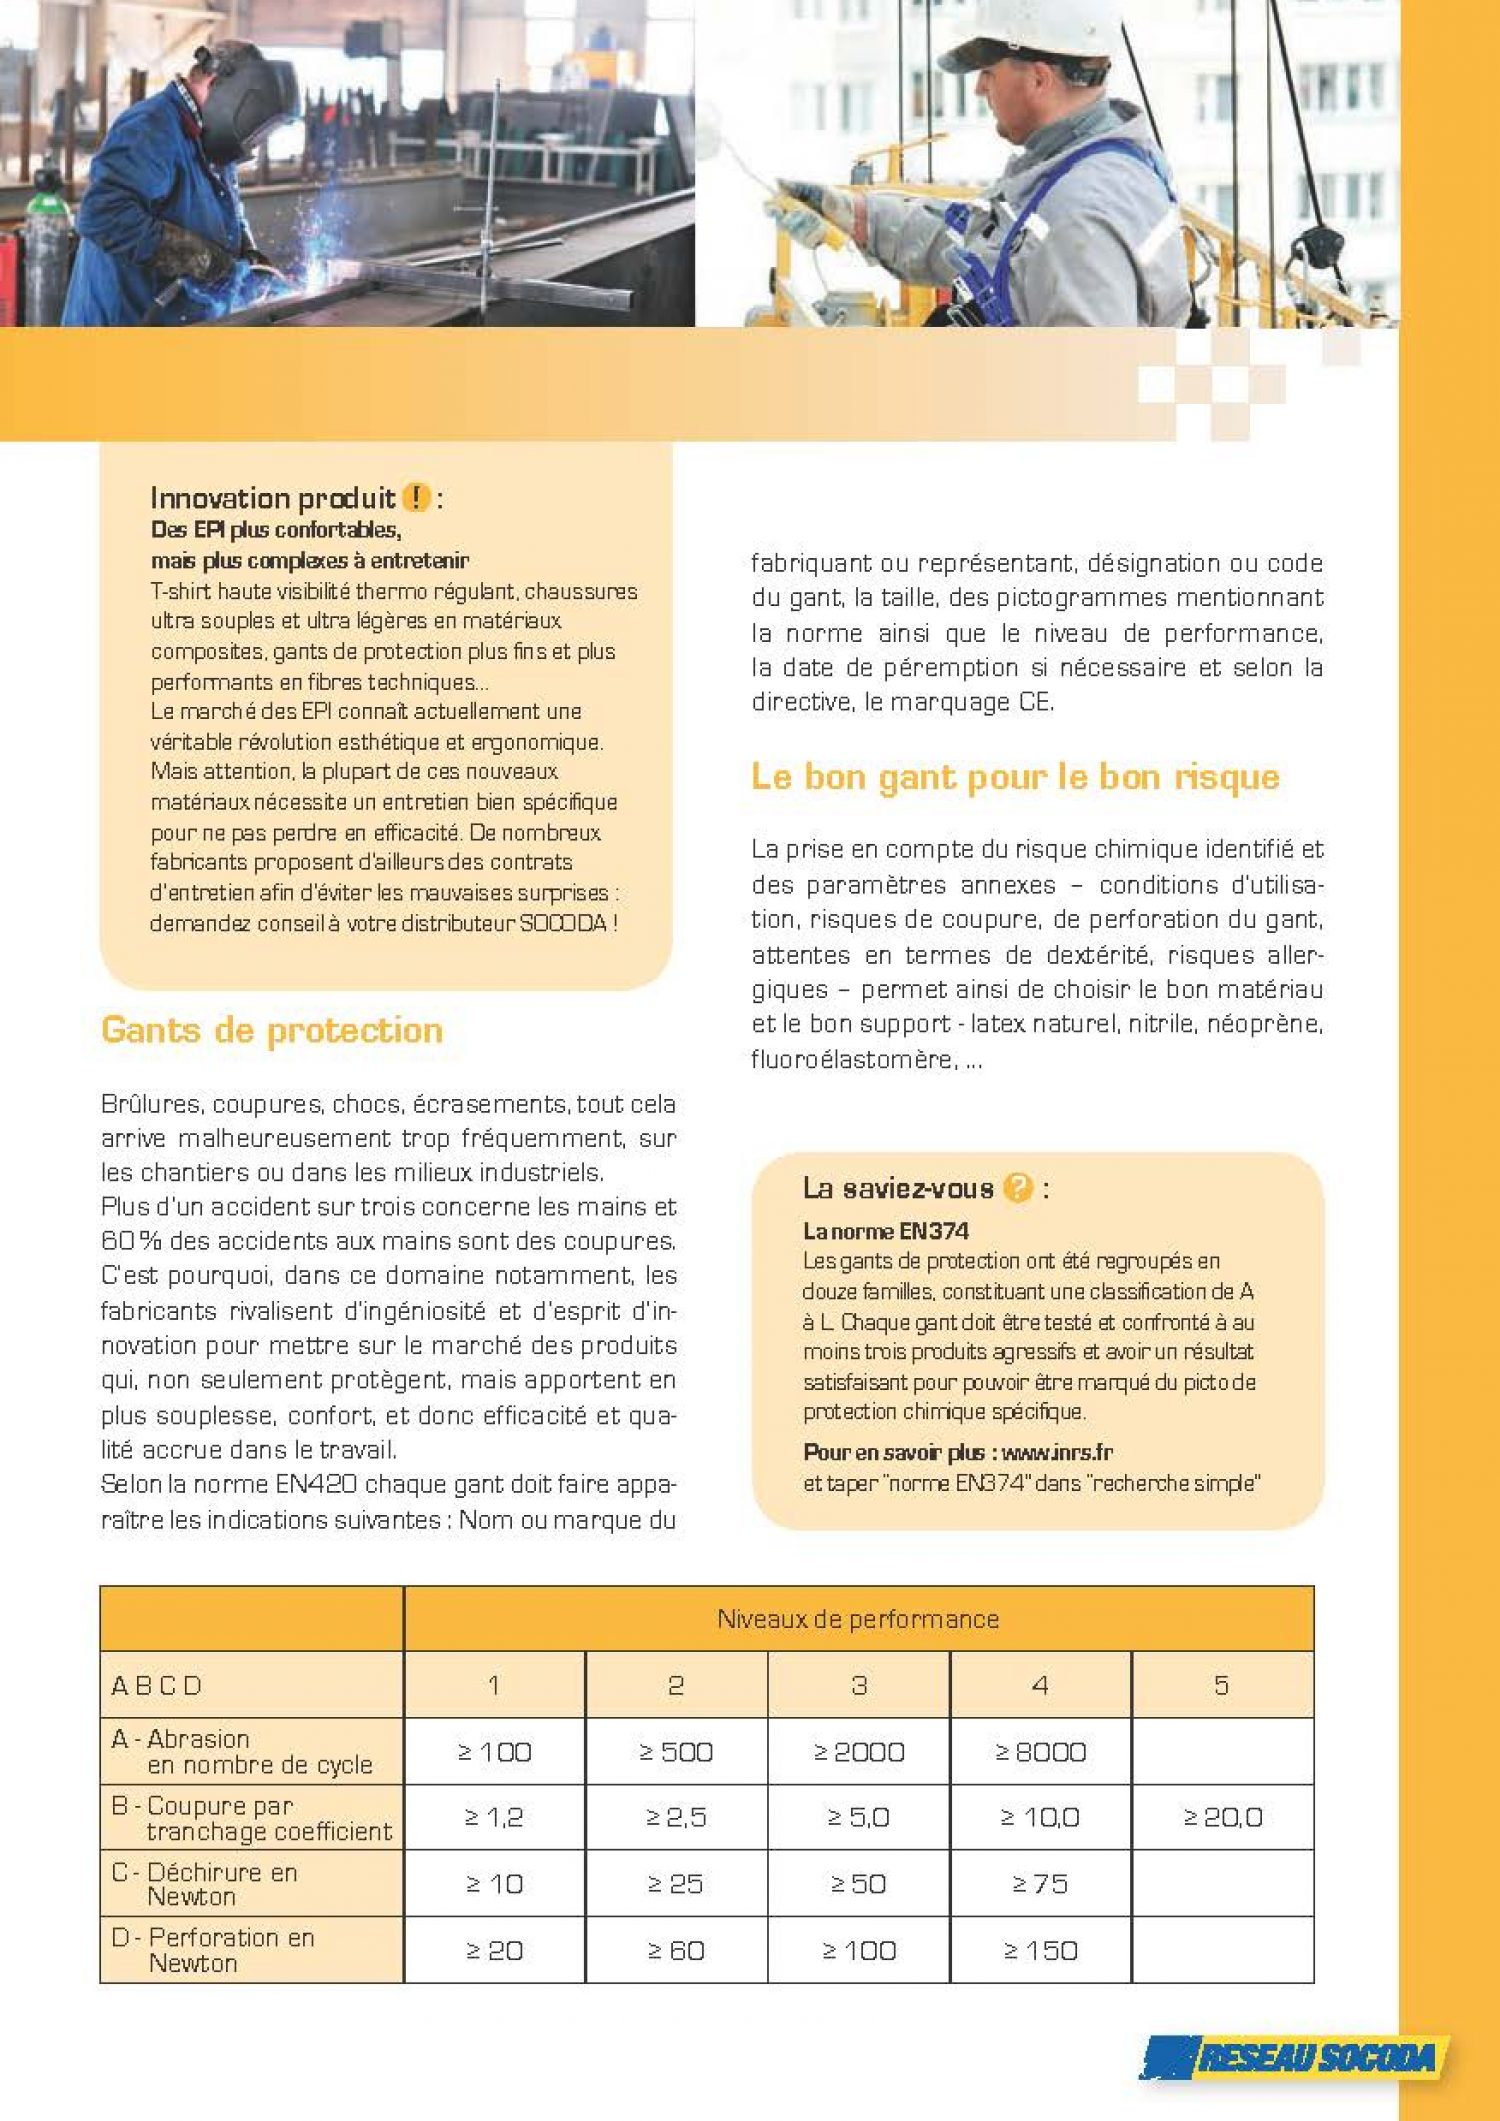 Guide Securite au Travail 2014 HDpdf_Page_33